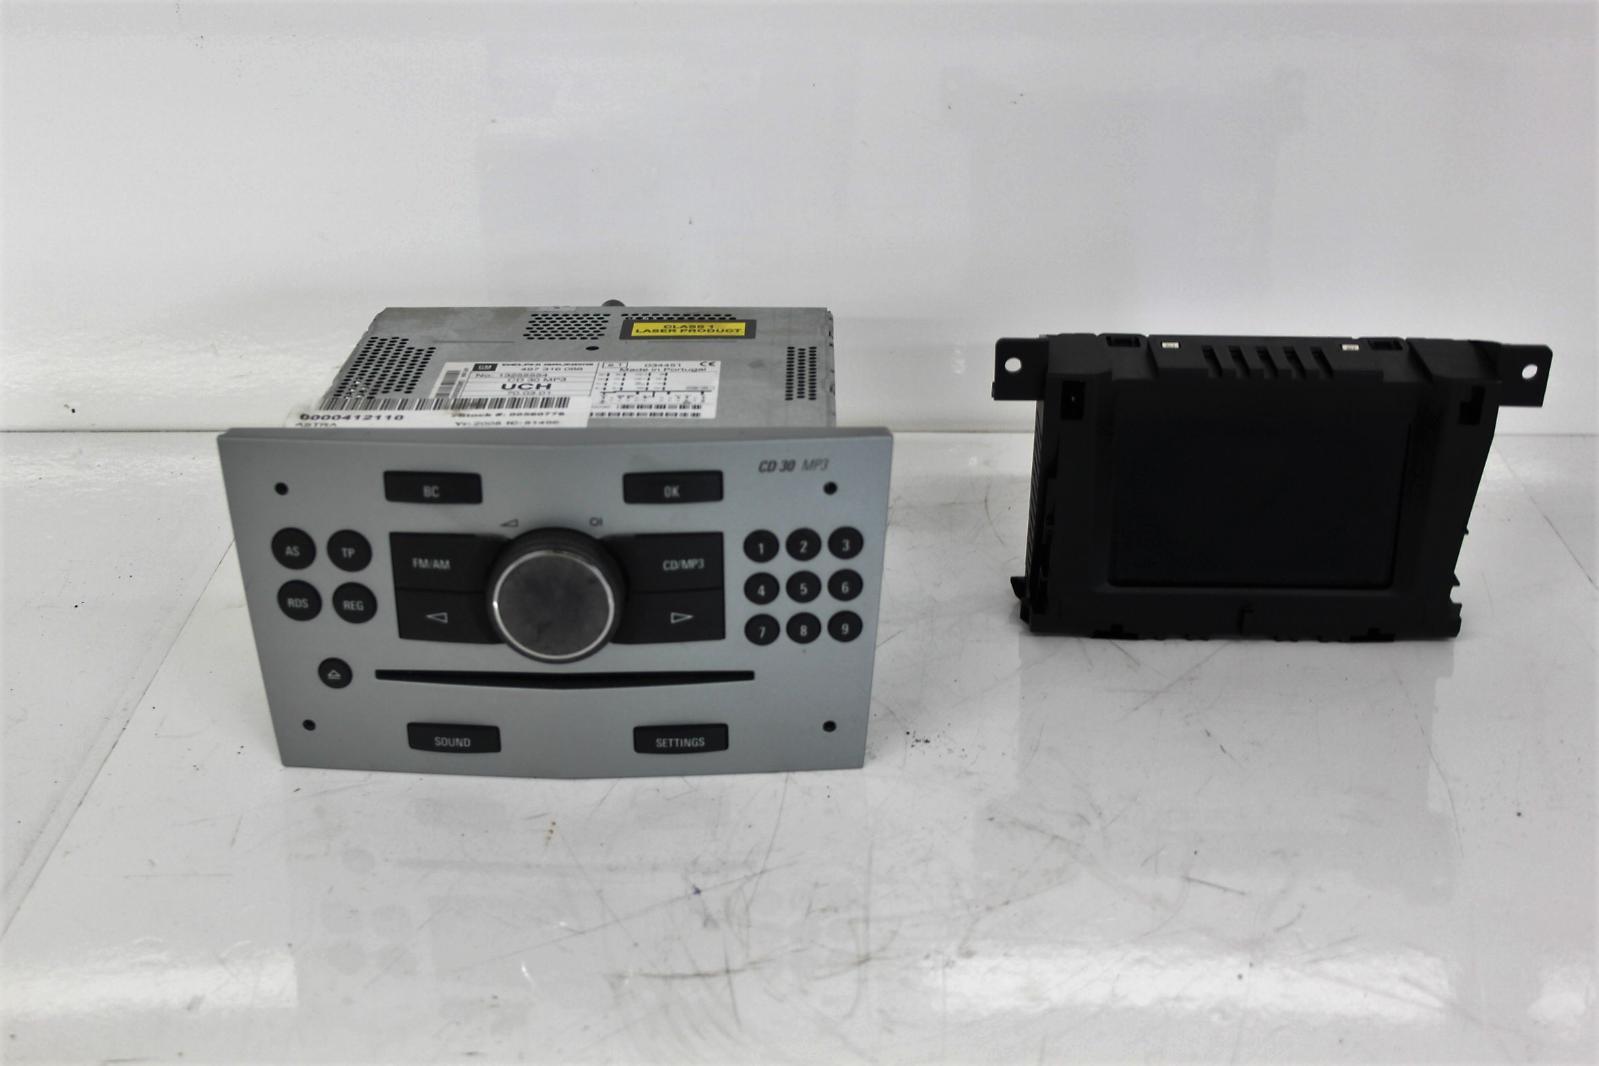 2008 vauxhall astra h cd30 stereo radio cd head unit. Black Bedroom Furniture Sets. Home Design Ideas